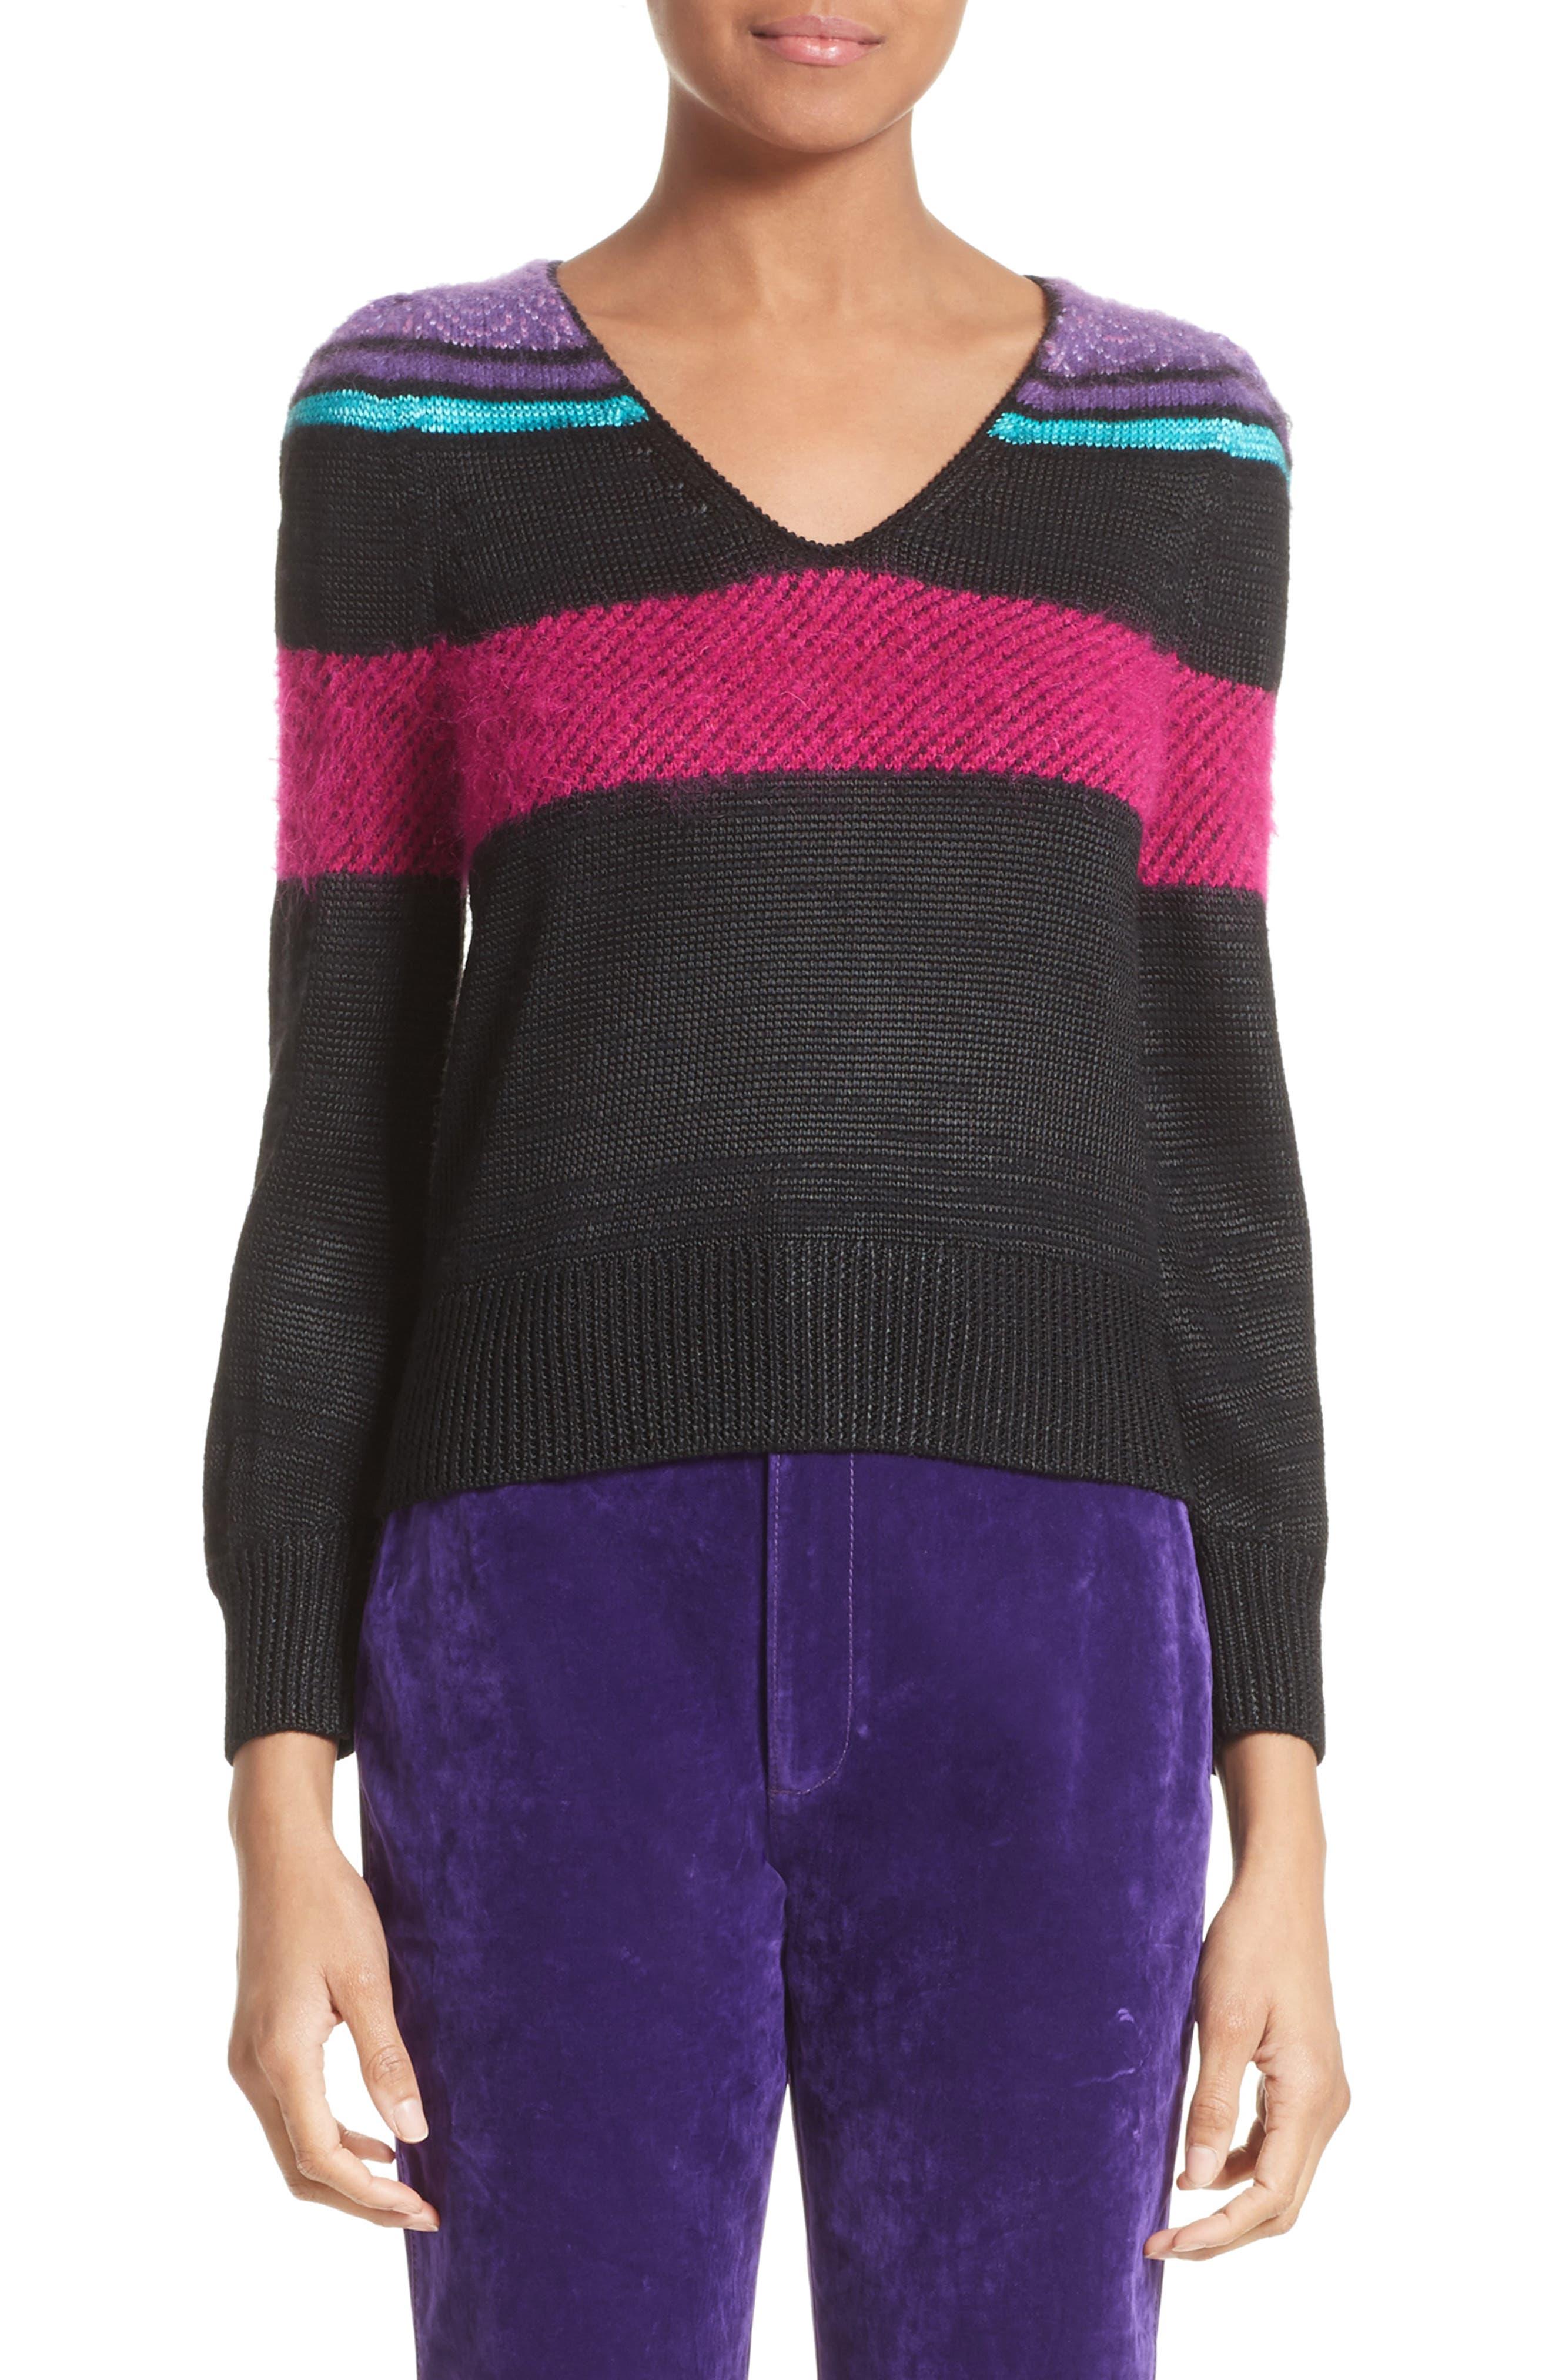 '80s Stripe Knit Sweater,                             Main thumbnail 1, color,                             002